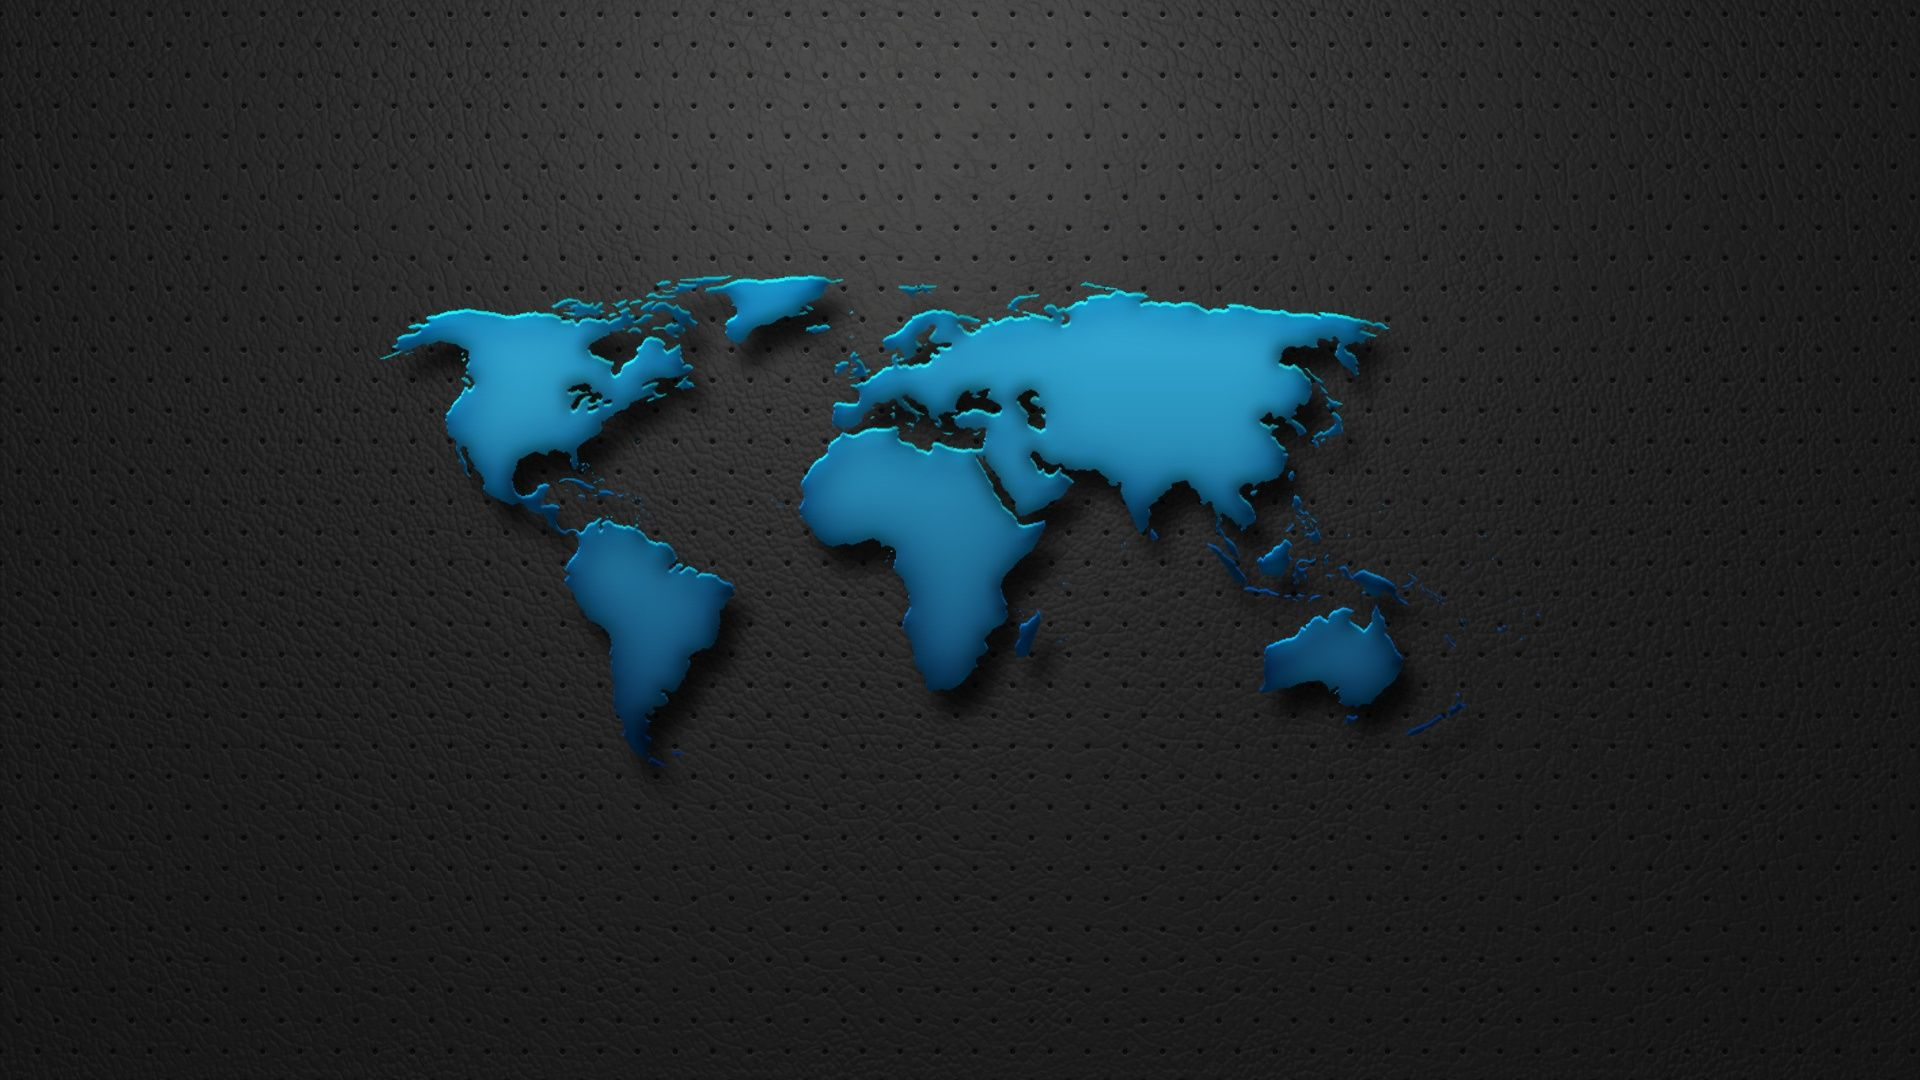 World Map wallpaper pc